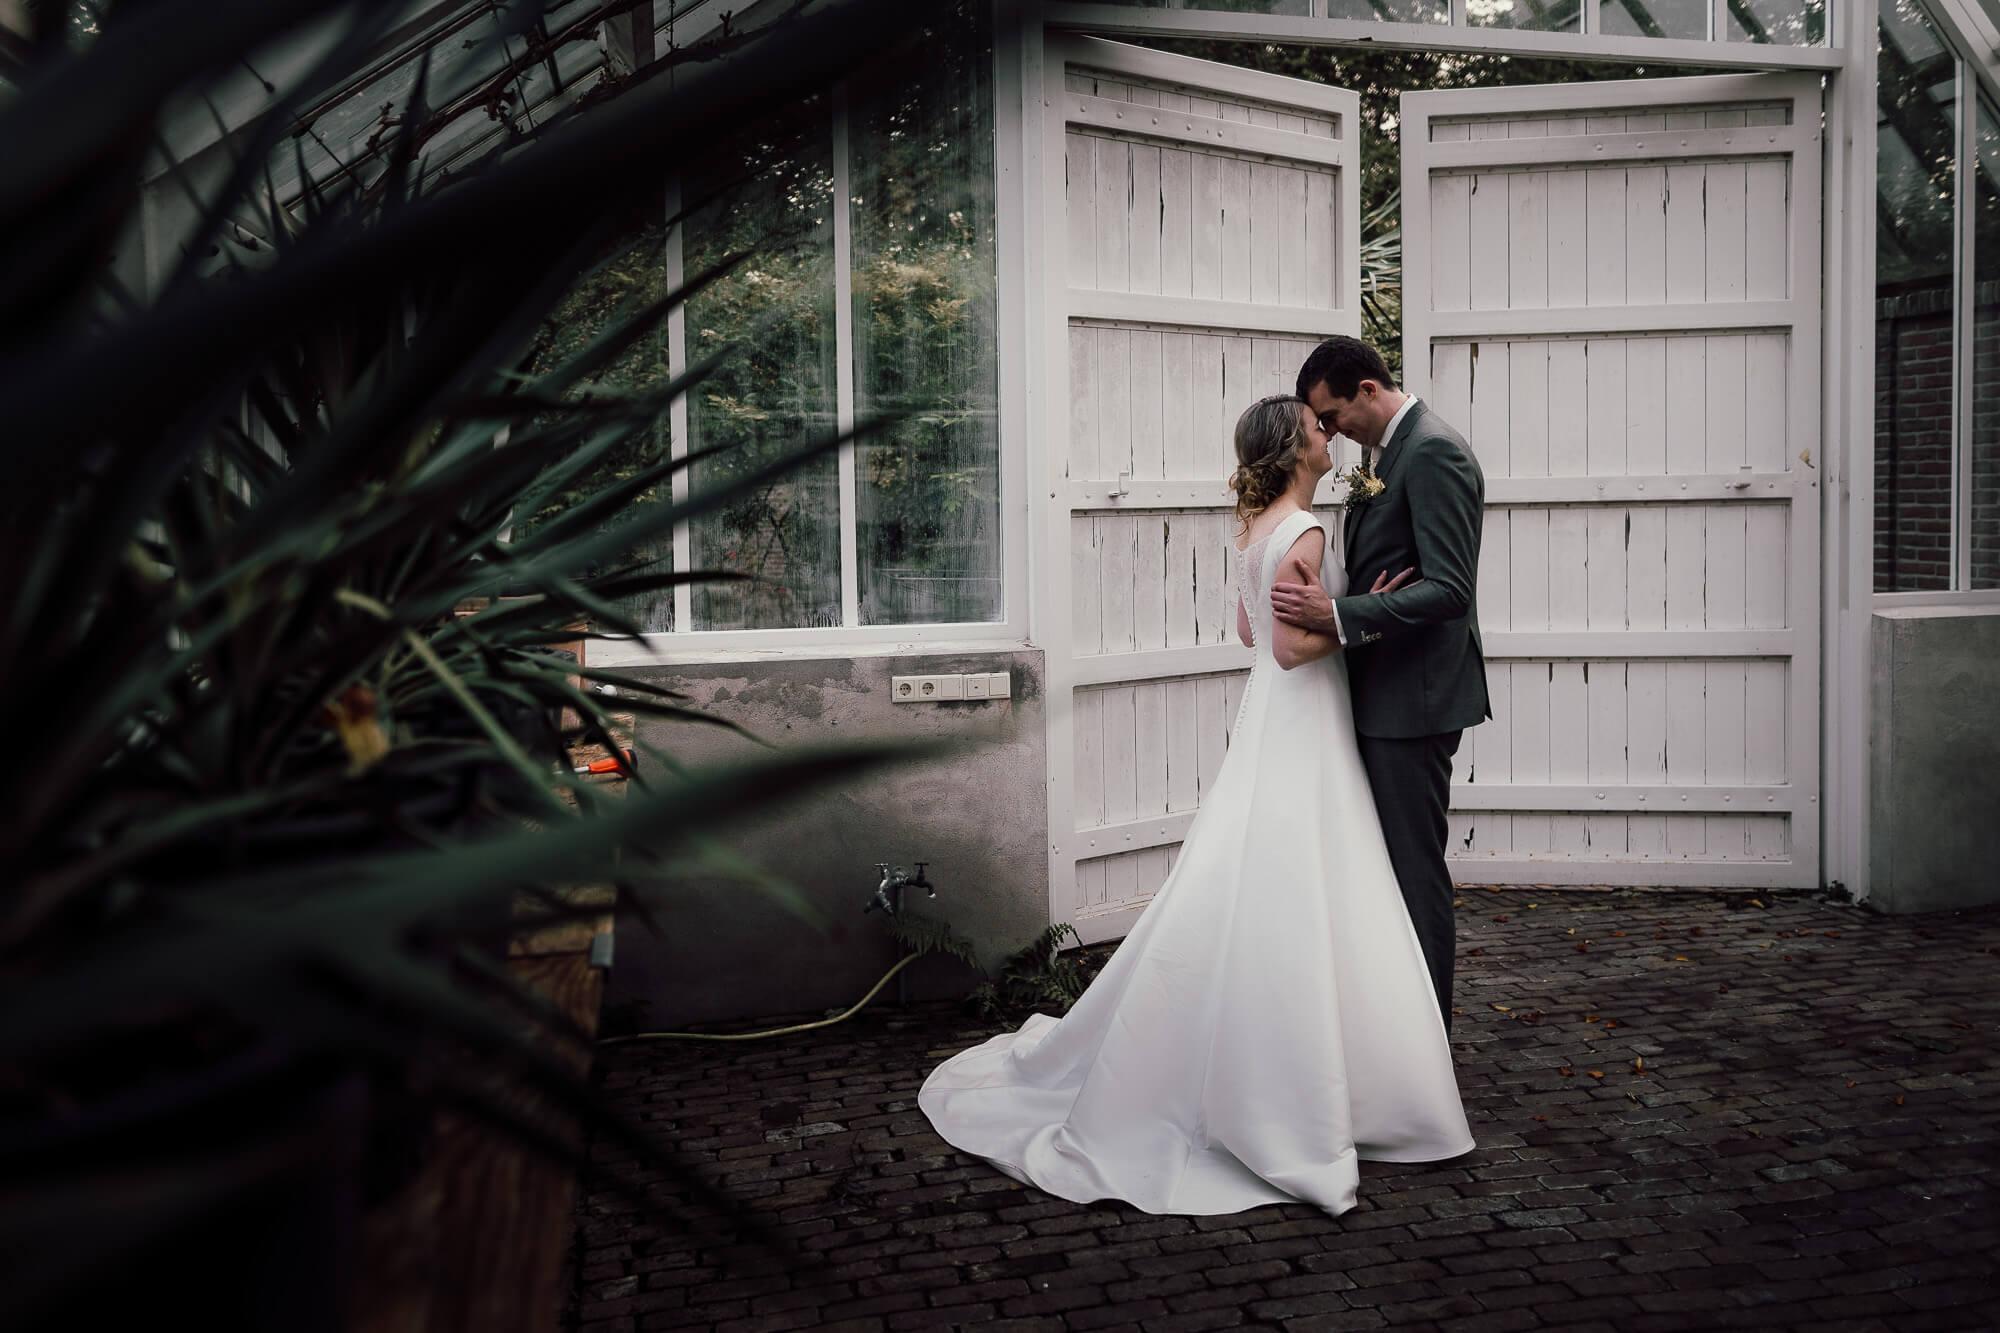 Egbert & Iris | Trouwen in Dronten